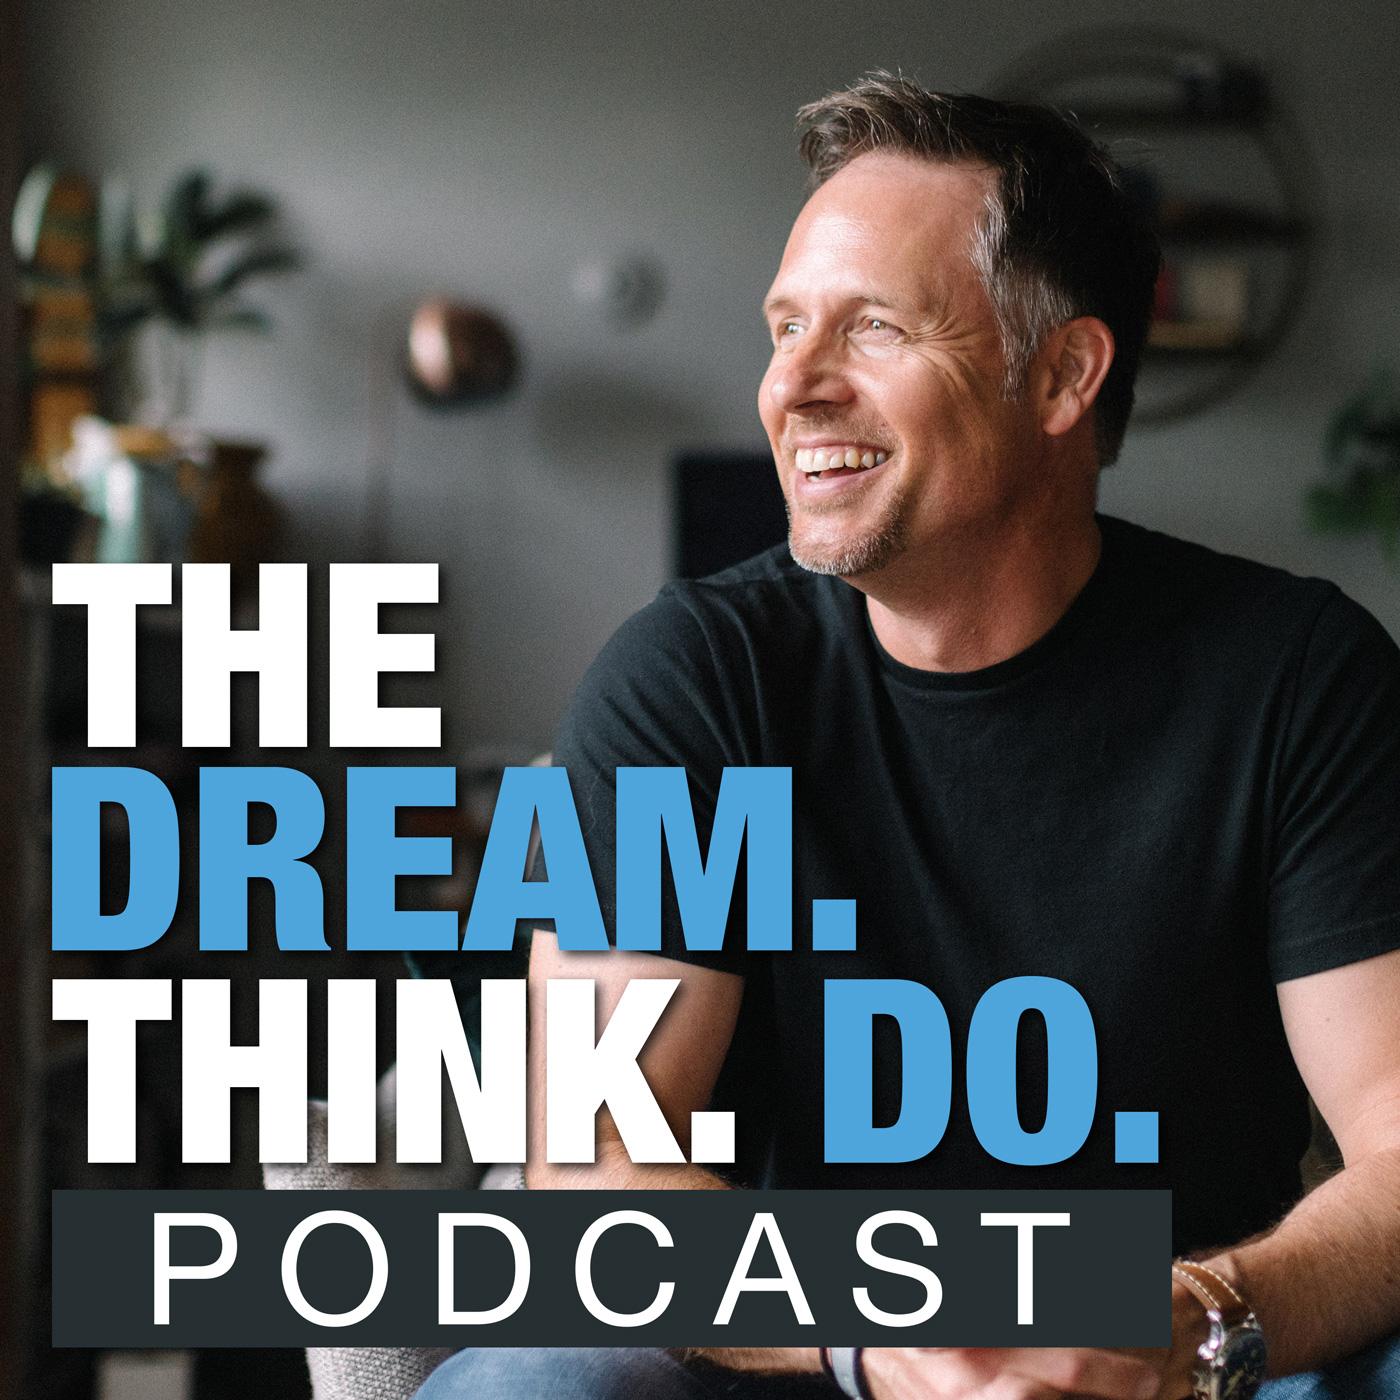 The DREAM THINK DO Podcast:contactus@mitchmatthews.com (contactus@mitchmatthews.com)